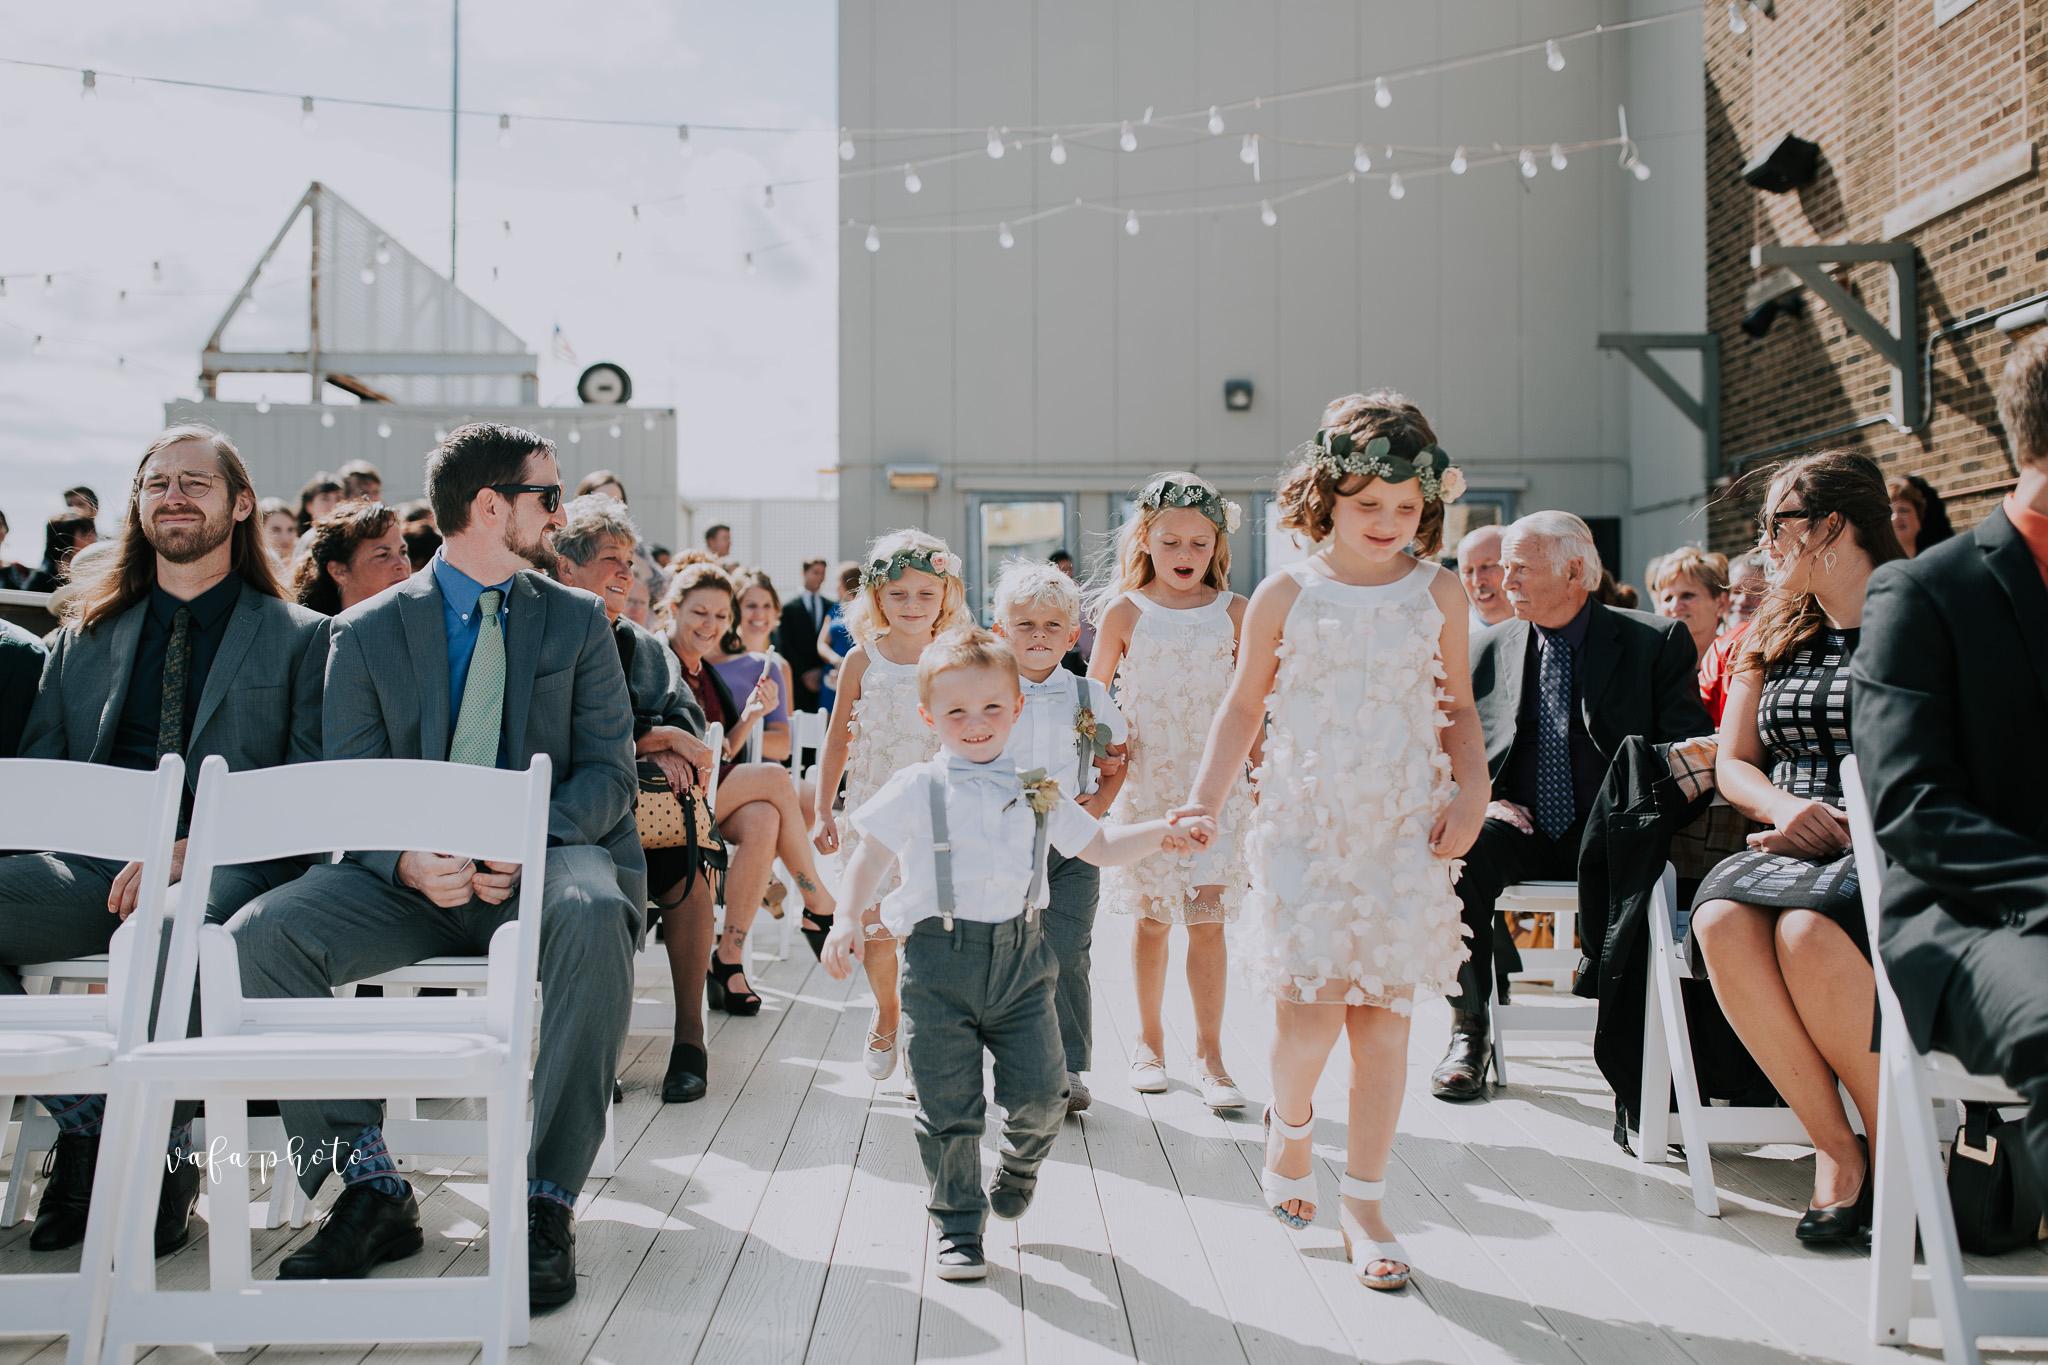 Milwaukee-Athletic-Club-Wedding-Amanda-Tony-Vafa-Photo-303.jpg